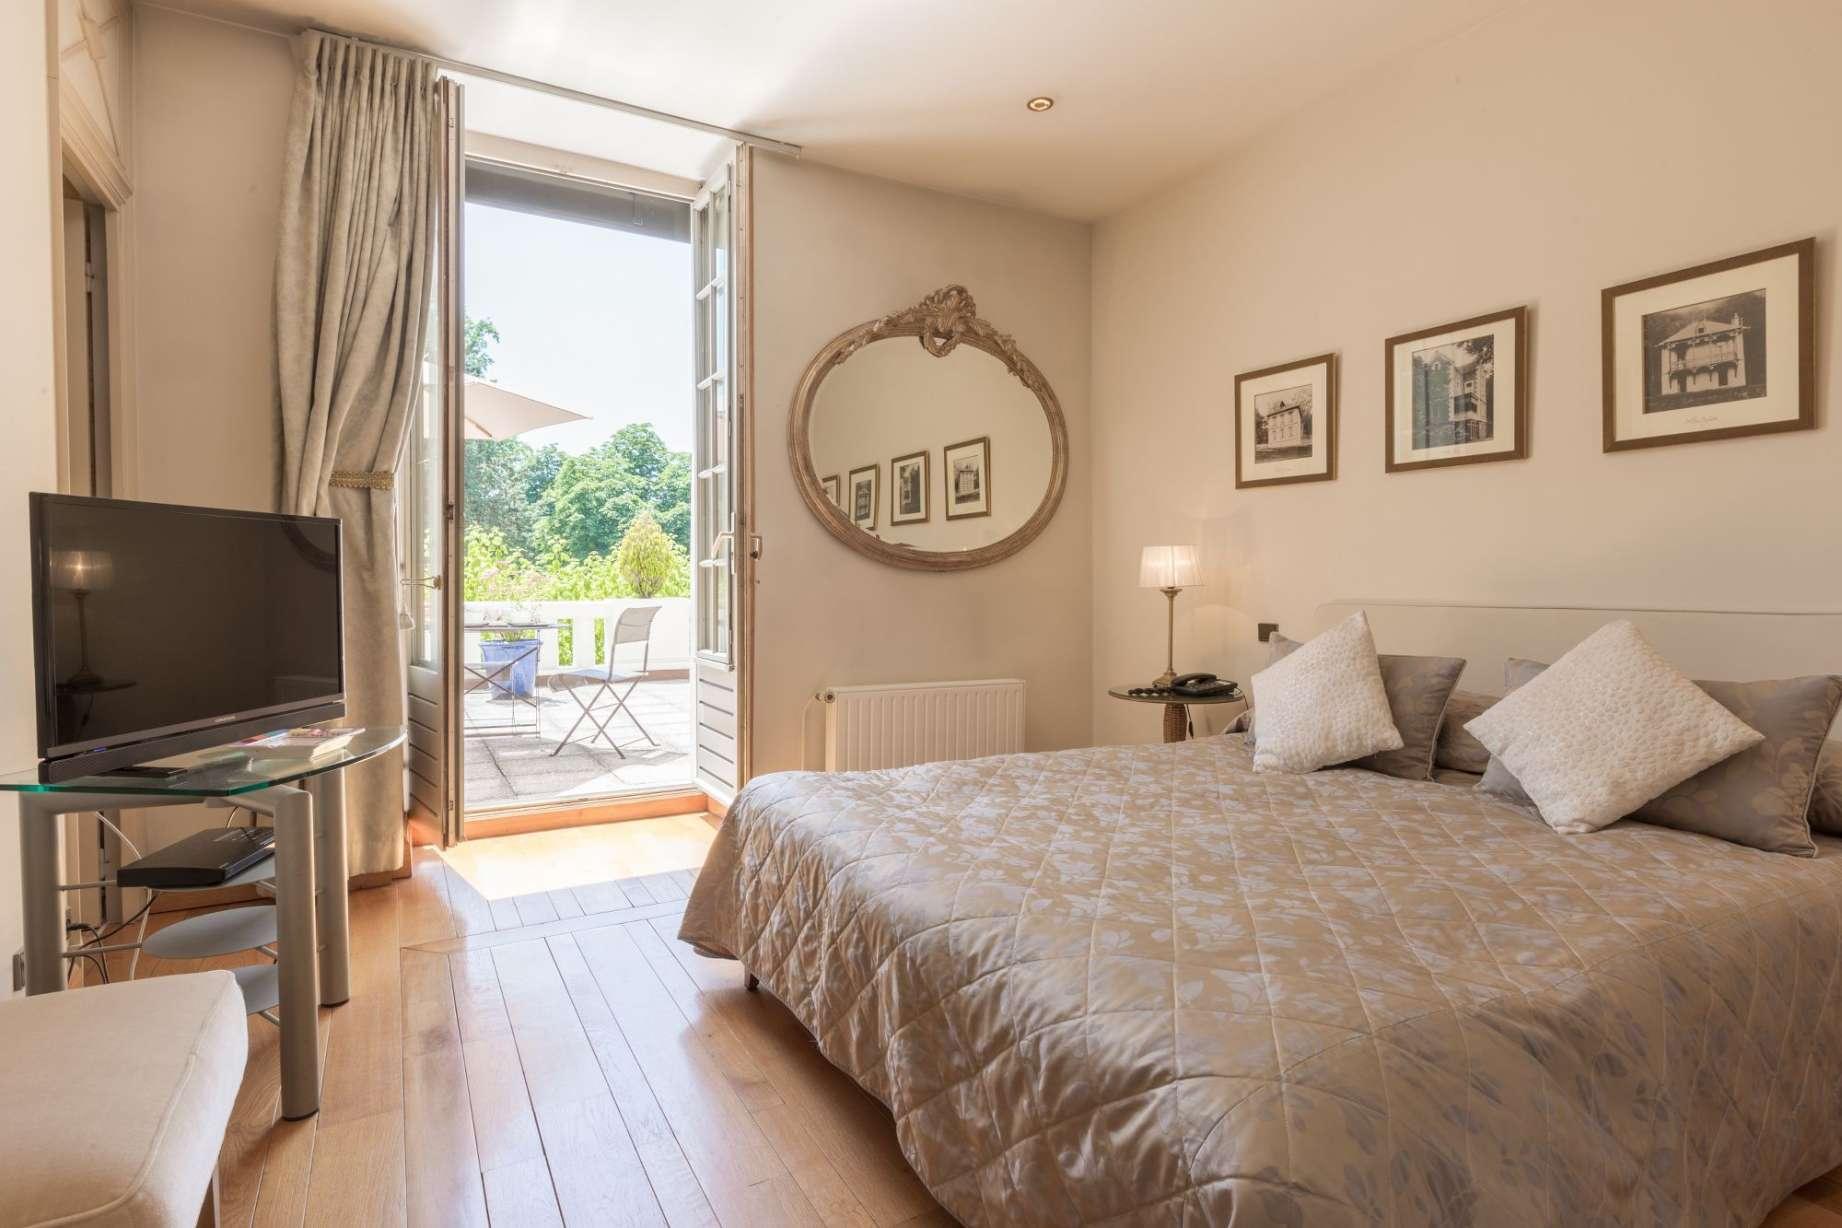 grand hotel uriage h tel spa 4 toiles en is re site officiel. Black Bedroom Furniture Sets. Home Design Ideas